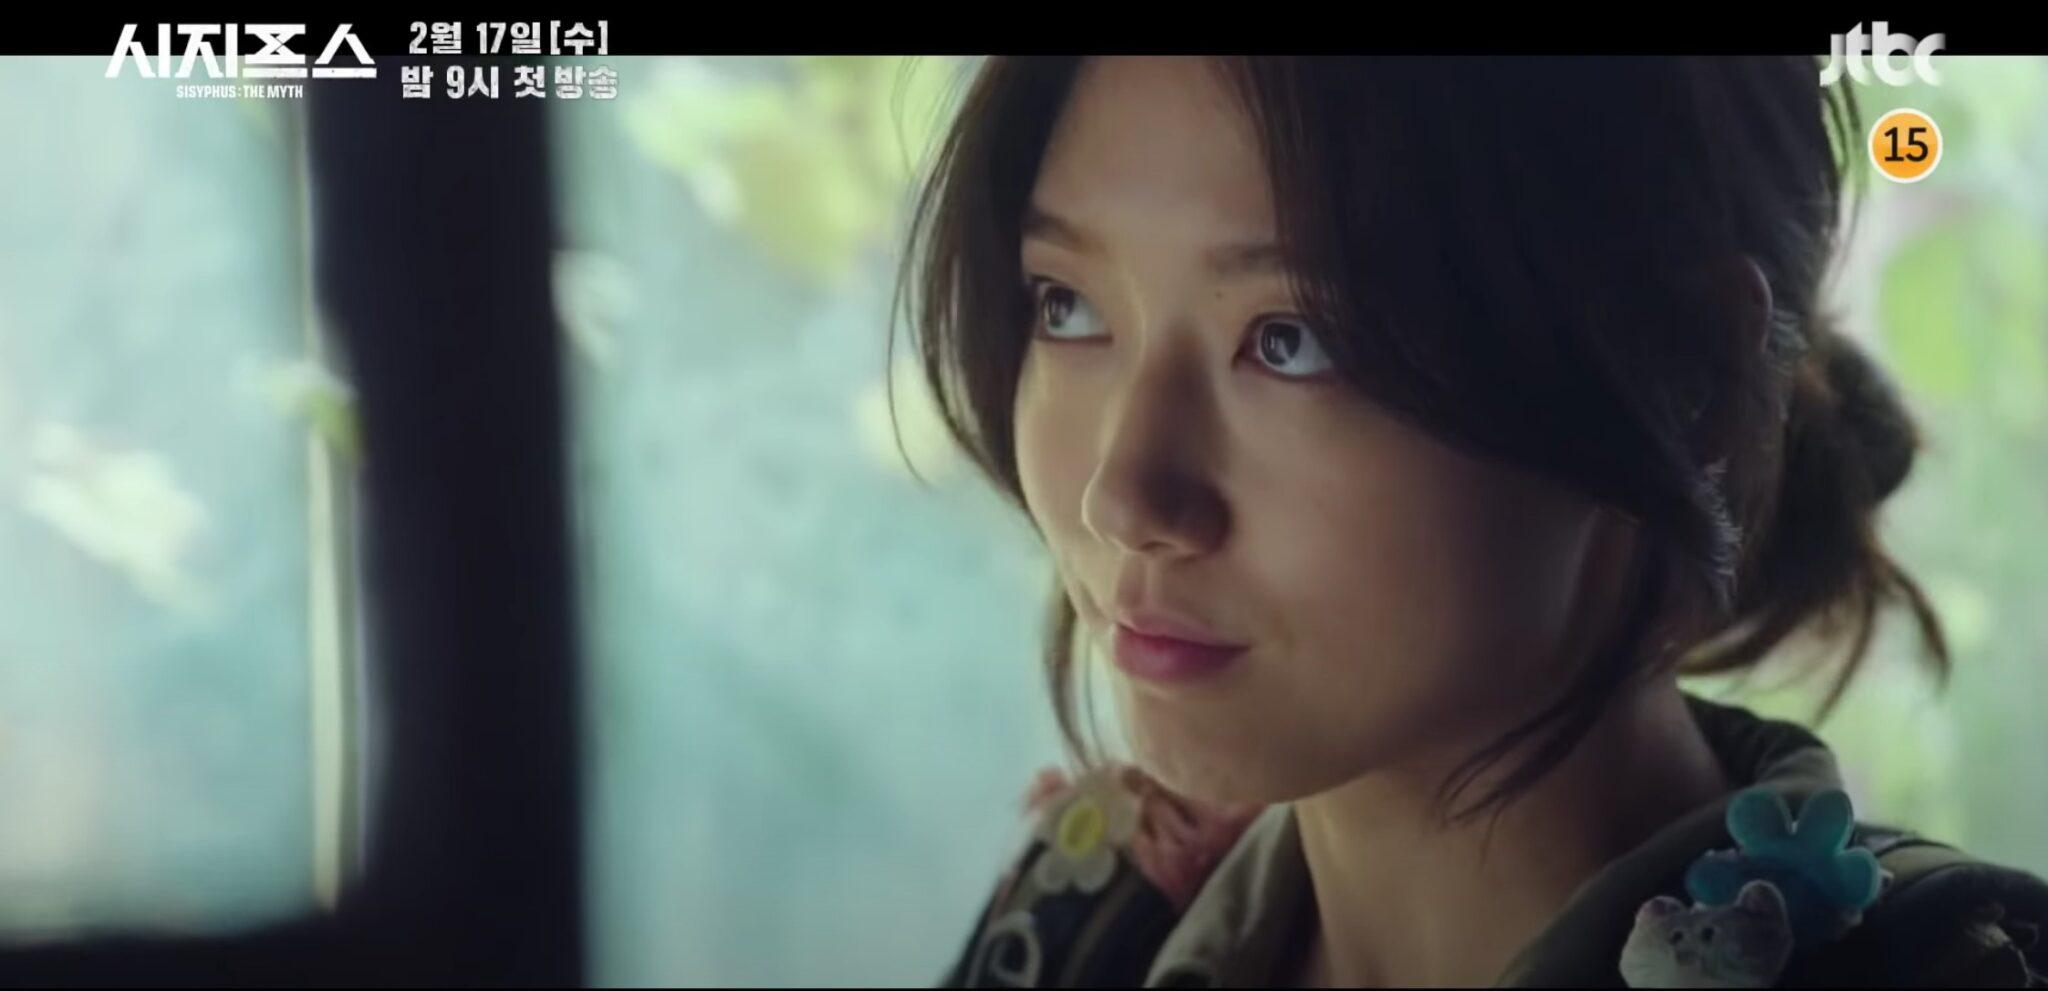 Park Shin-hye journeys through a ruined Seoul in Sisyphus: The Myth